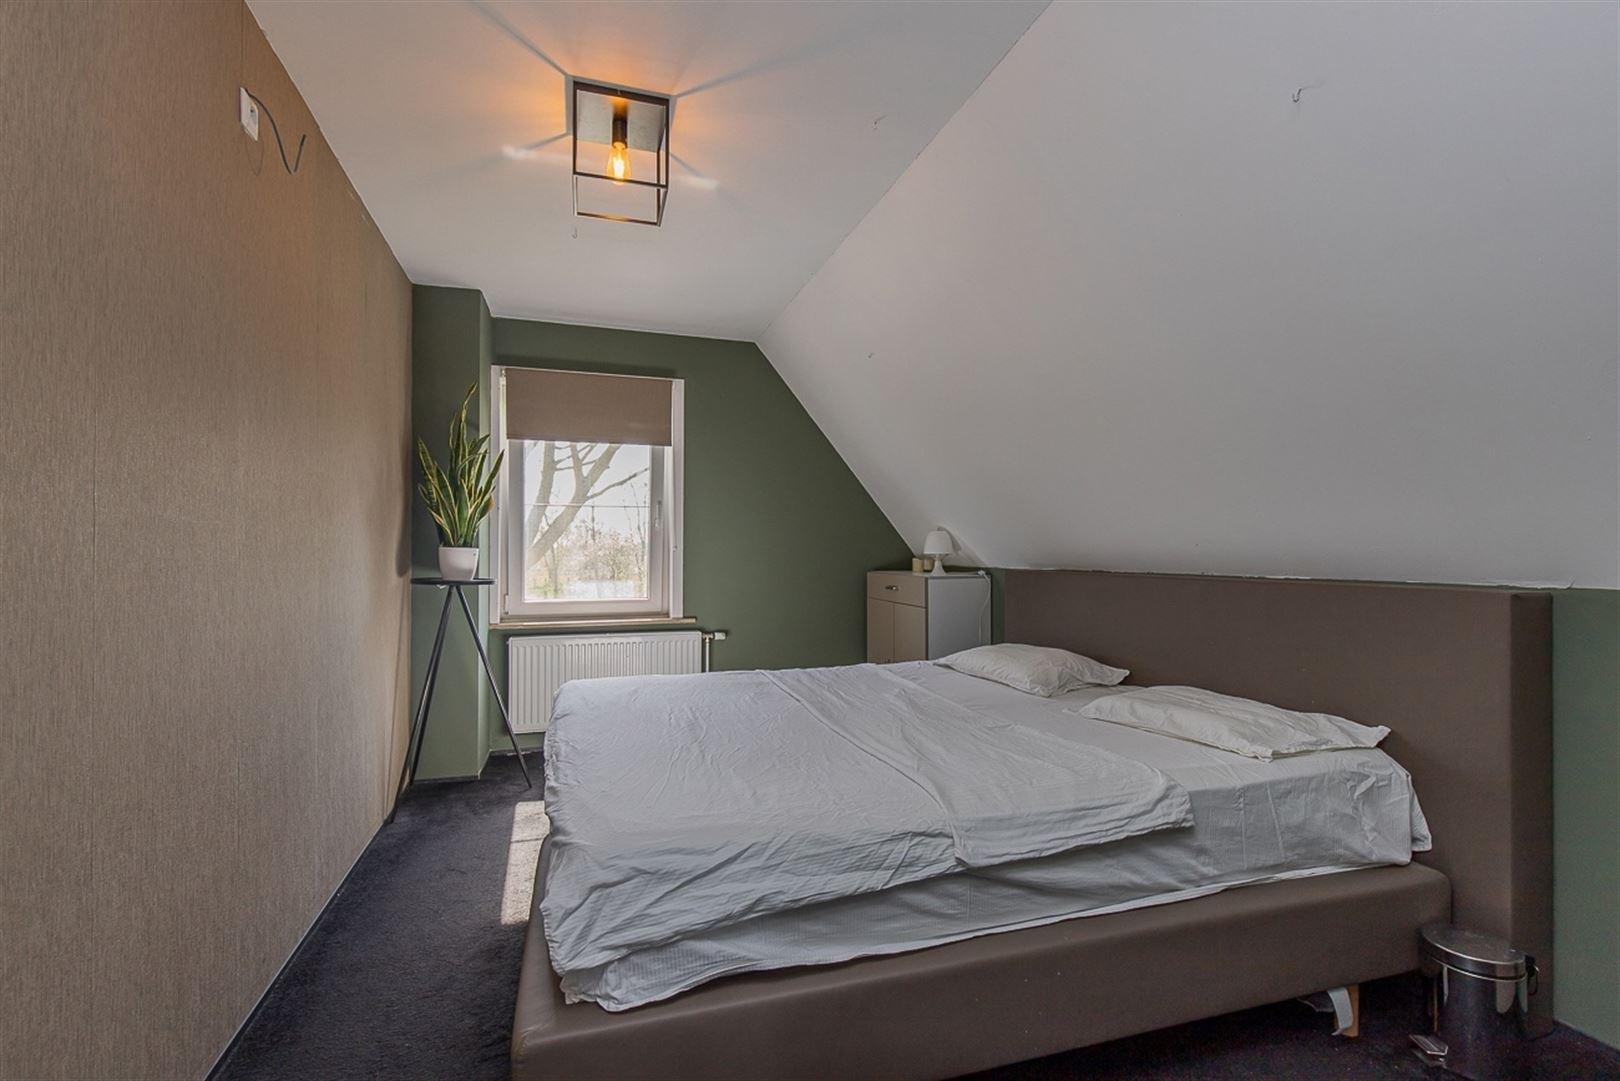 Foto 14 : Villa te 9100 SINT-NIKLAAS (België) - Prijs € 549.000